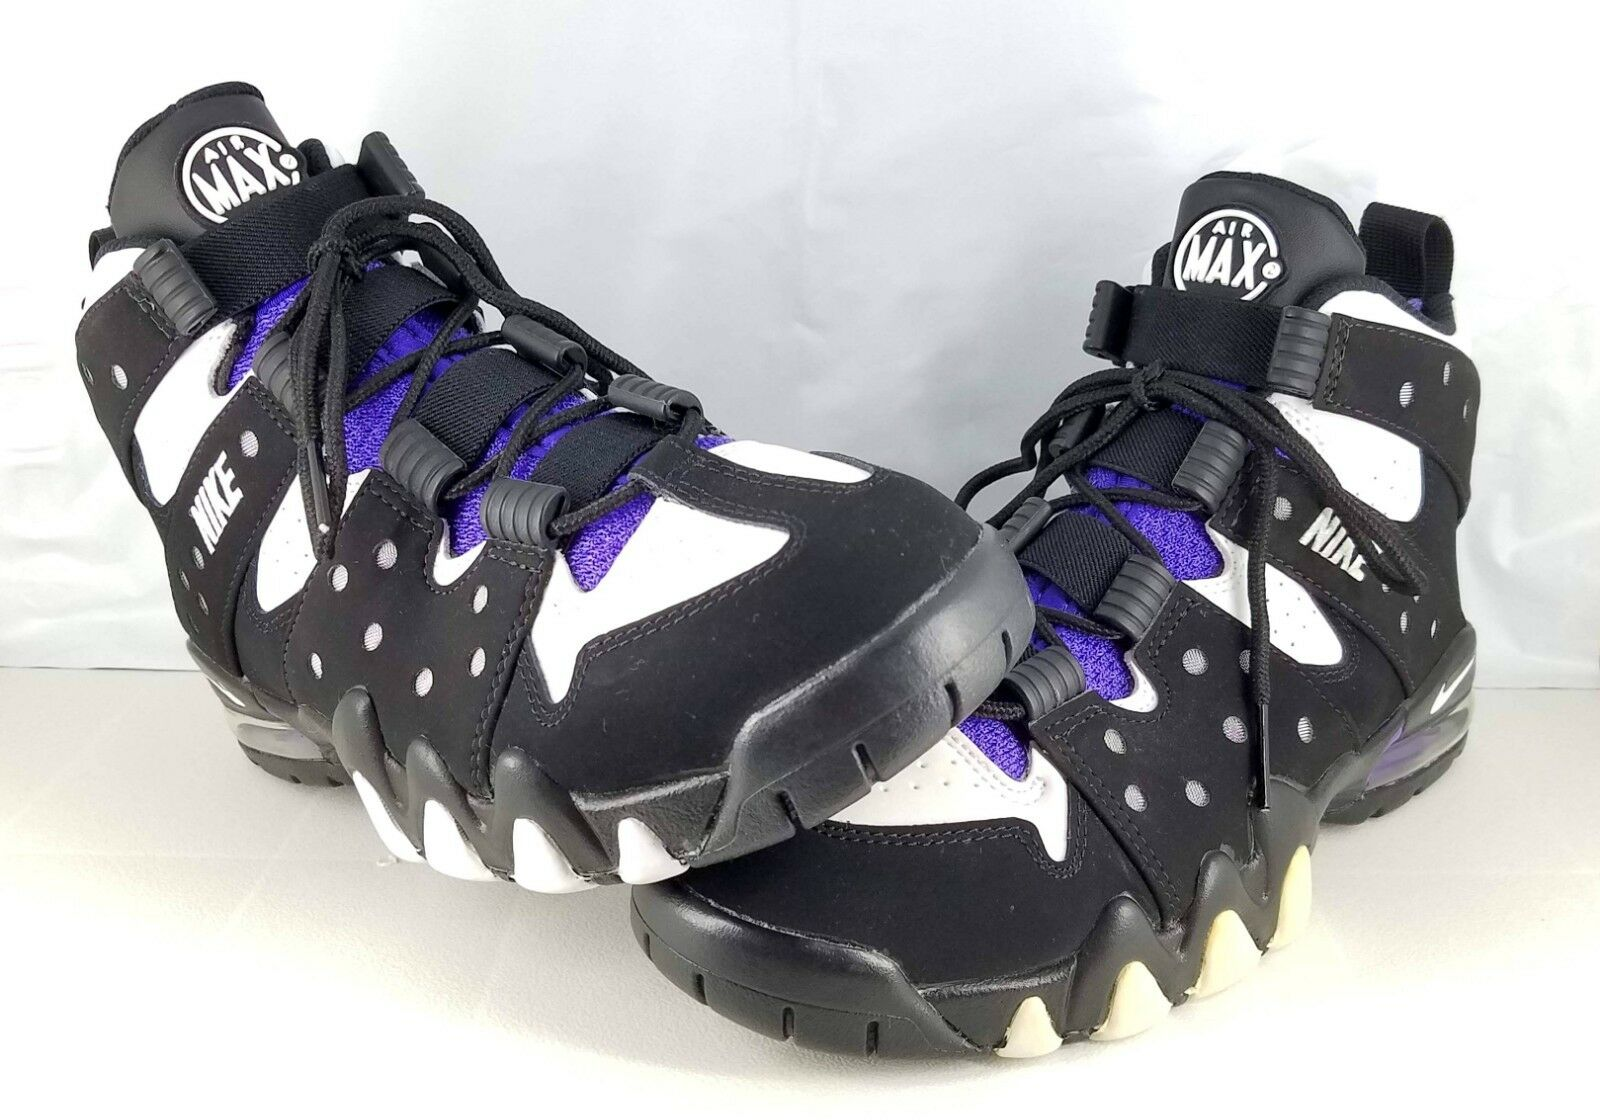 Neue nike air max - 2 cb - schwarz 94  7,5 schwarz - / lila / Weiß 305440-006 2015 b19832